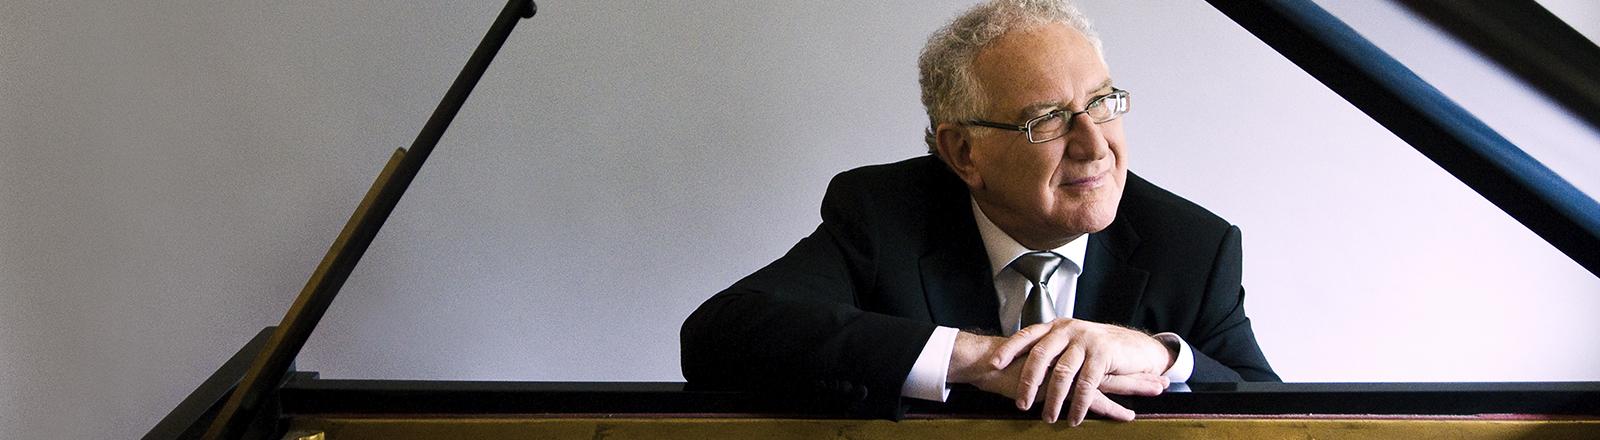 Robert Silverman, piano